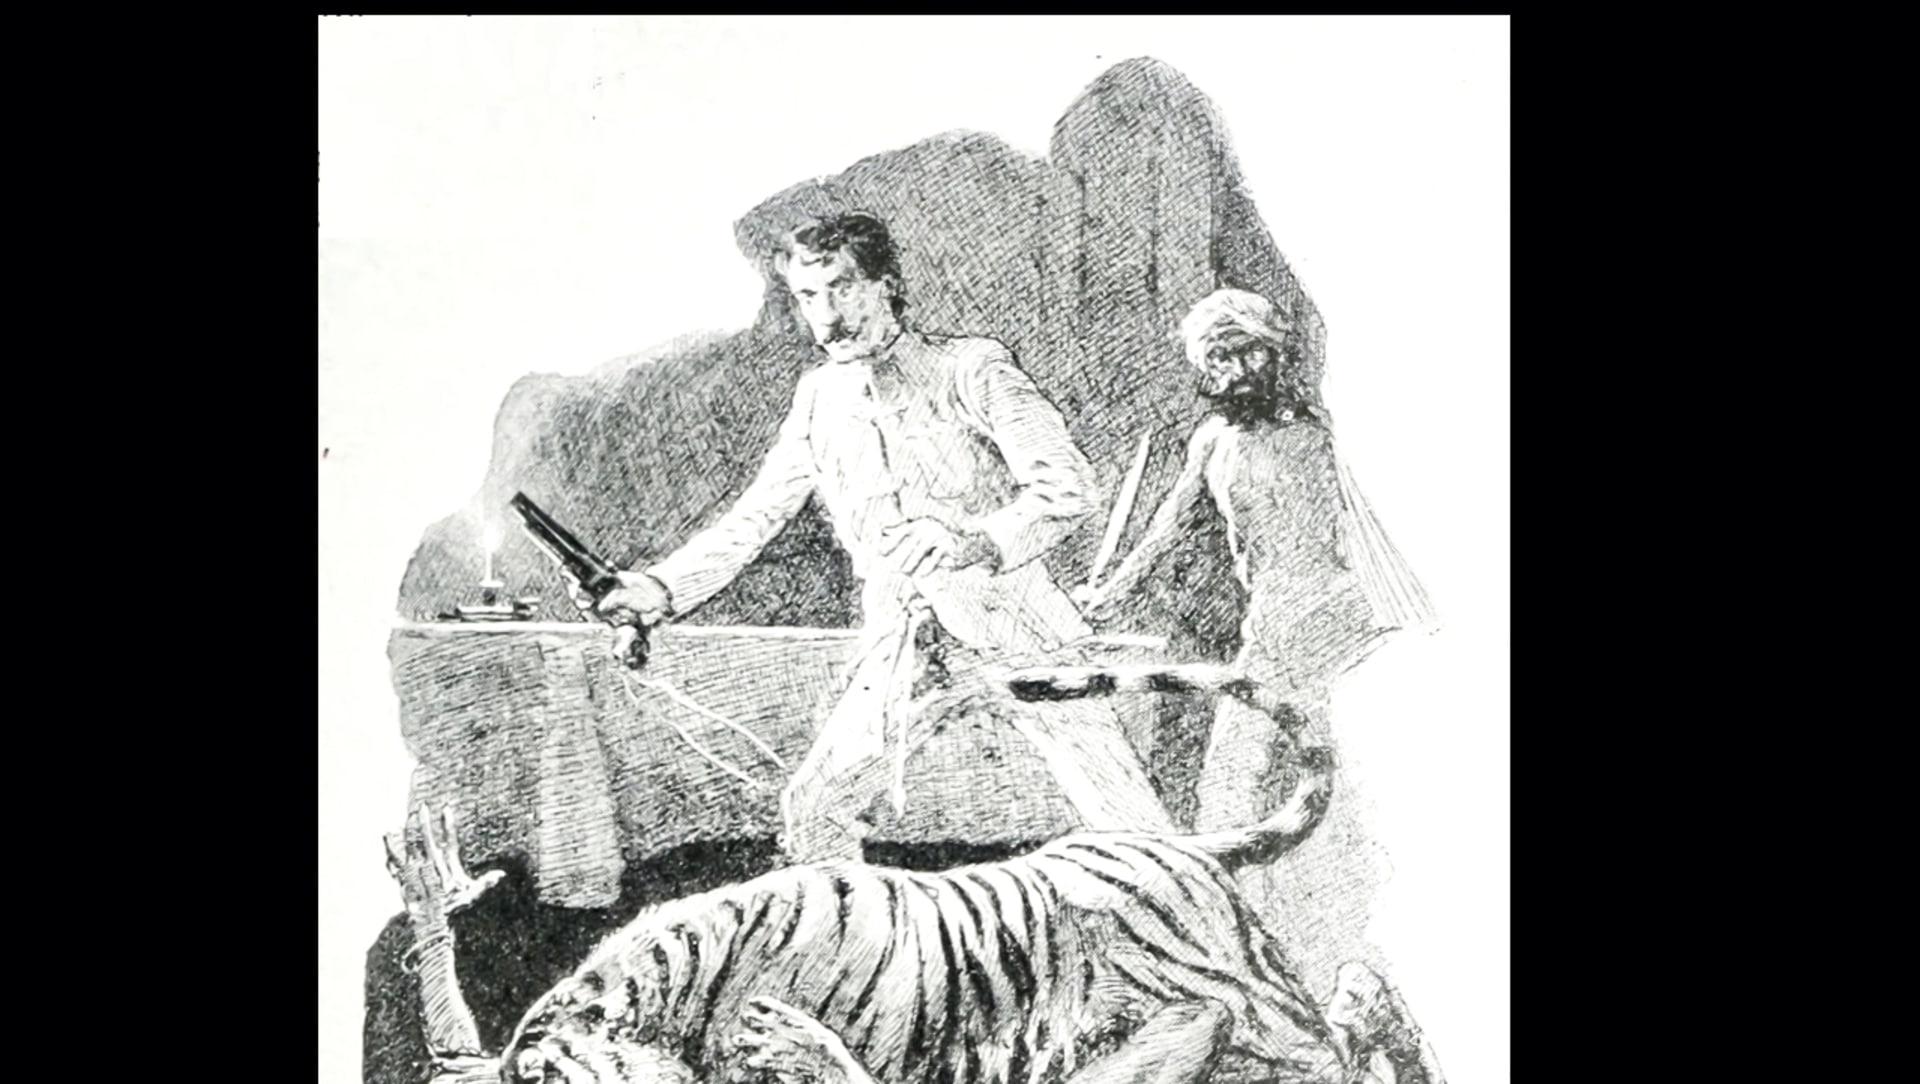 The Gallant Tiger: Faithful Unto Death